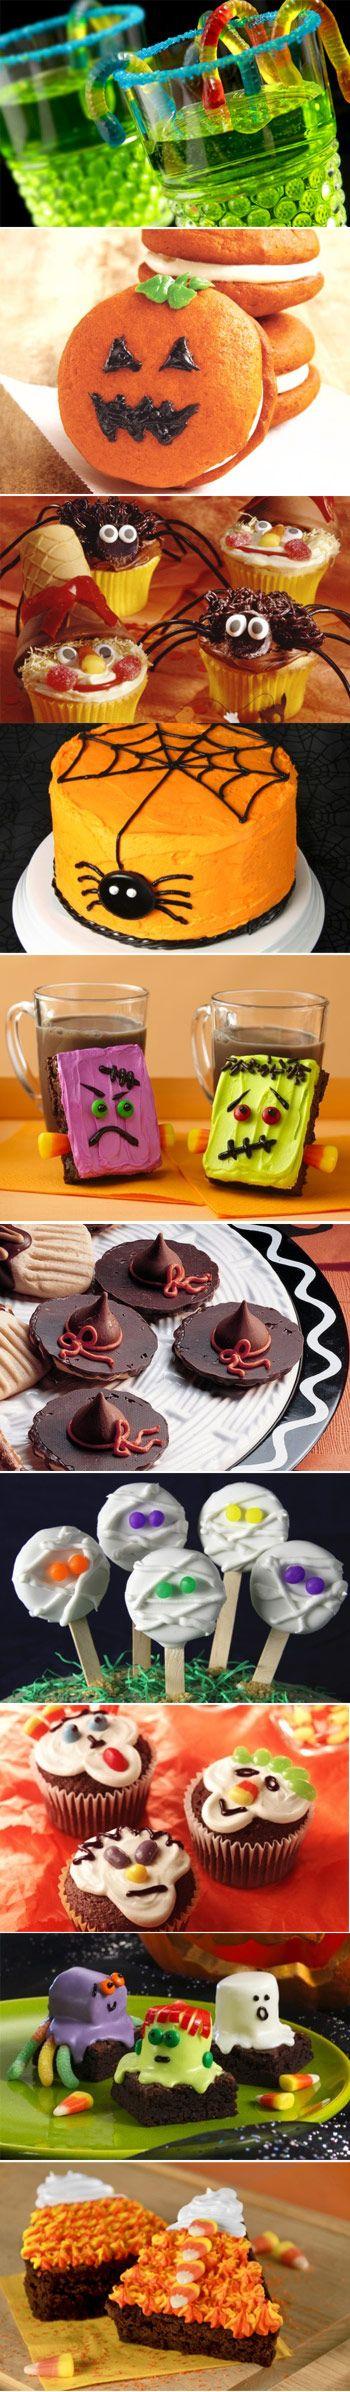 Tons of Halloween Treats!